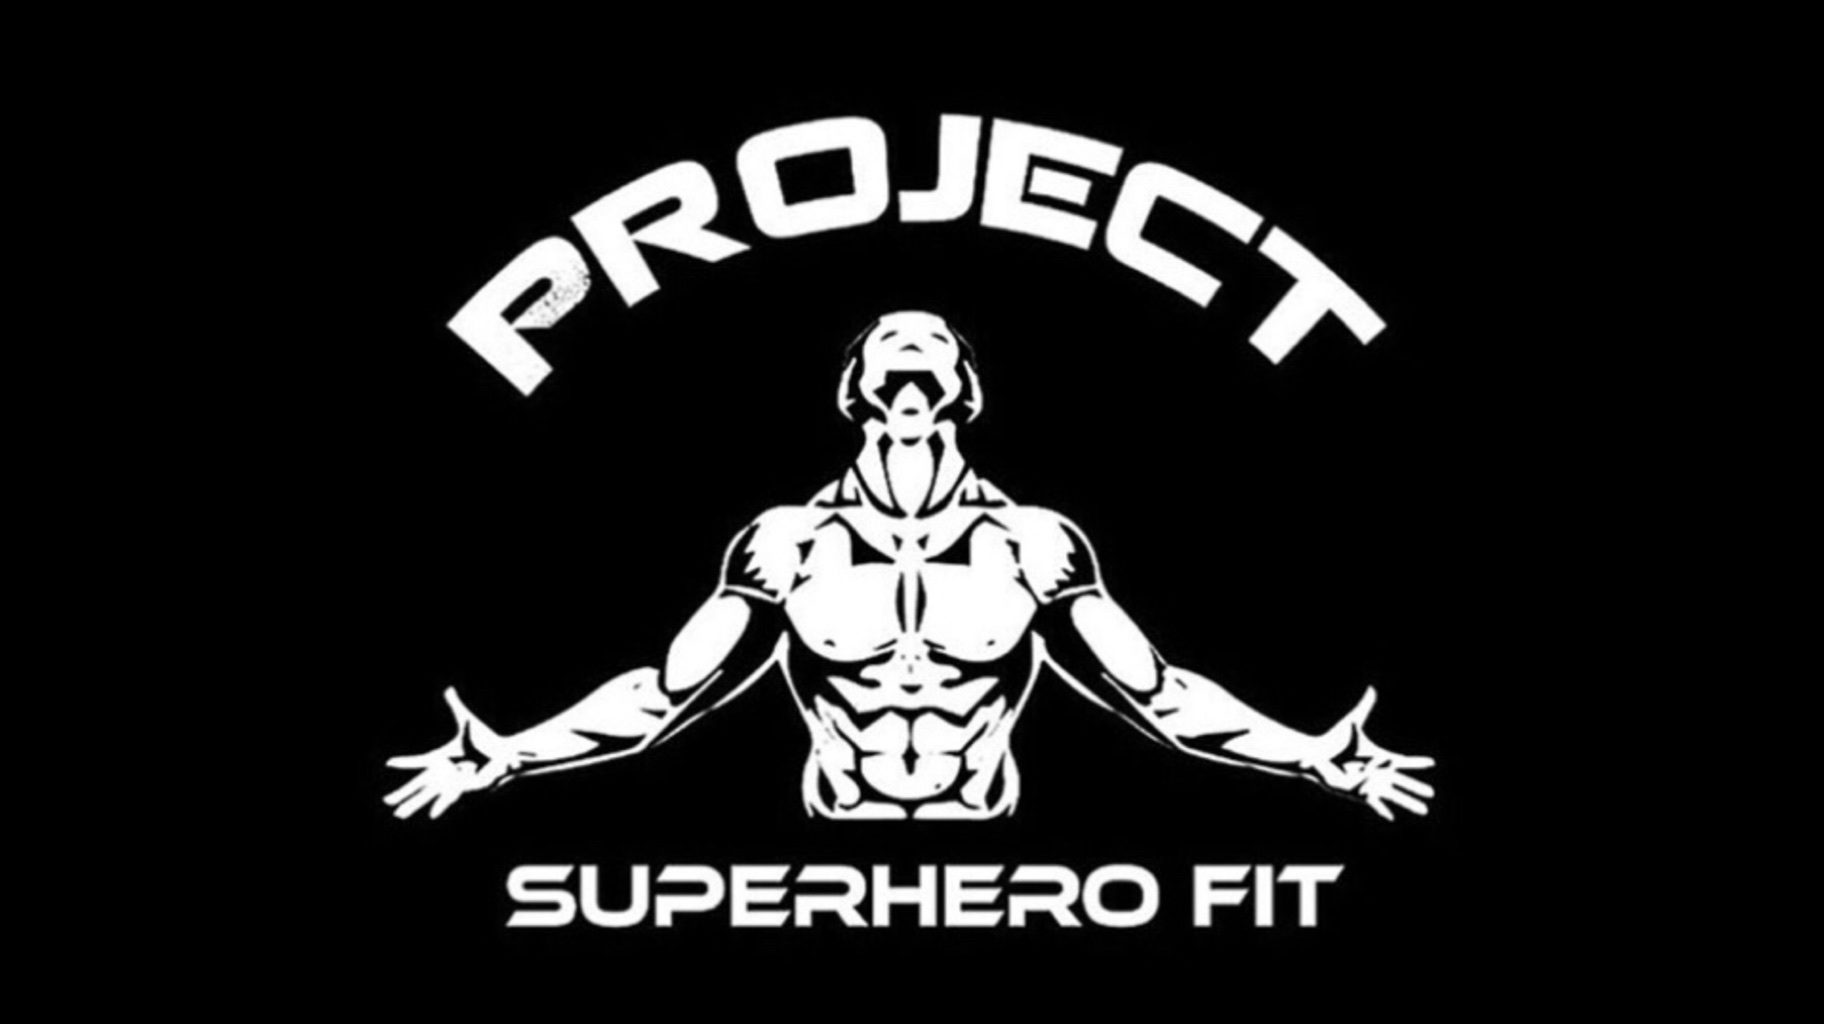 Project Superhero Fit